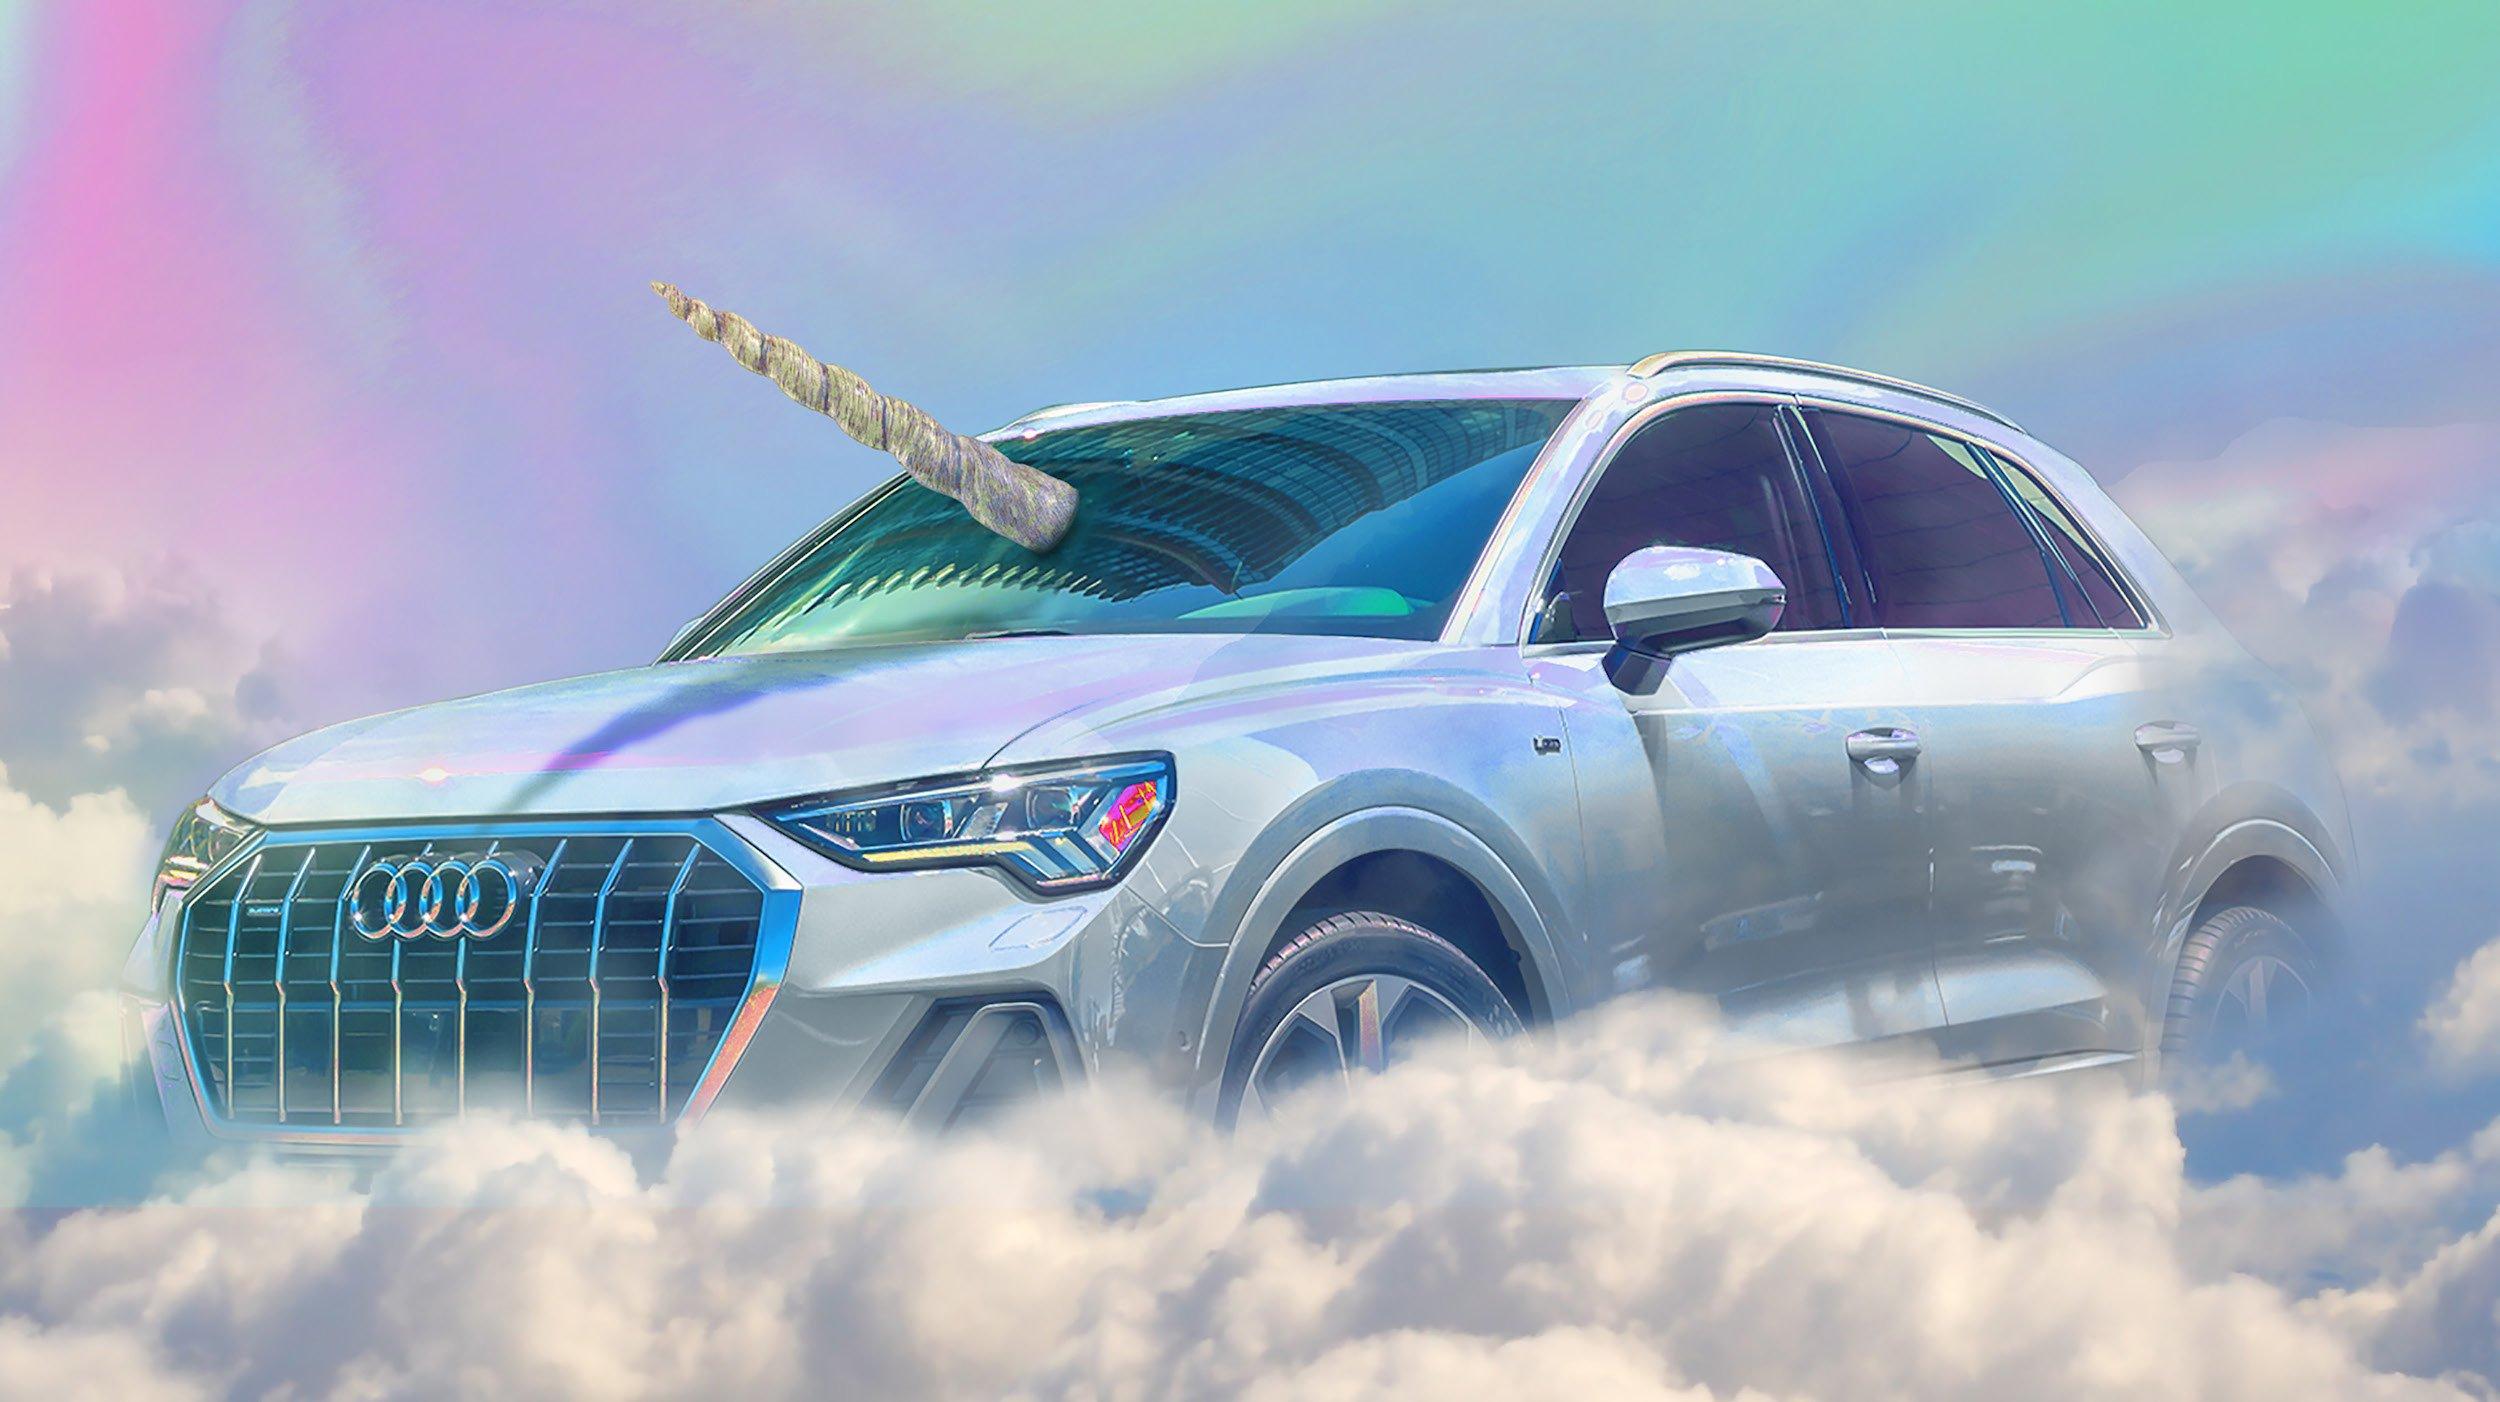 Audi Q3 unicorn 150x150 - Audi Q3 celebrates Halloween by dressing as a unicorn